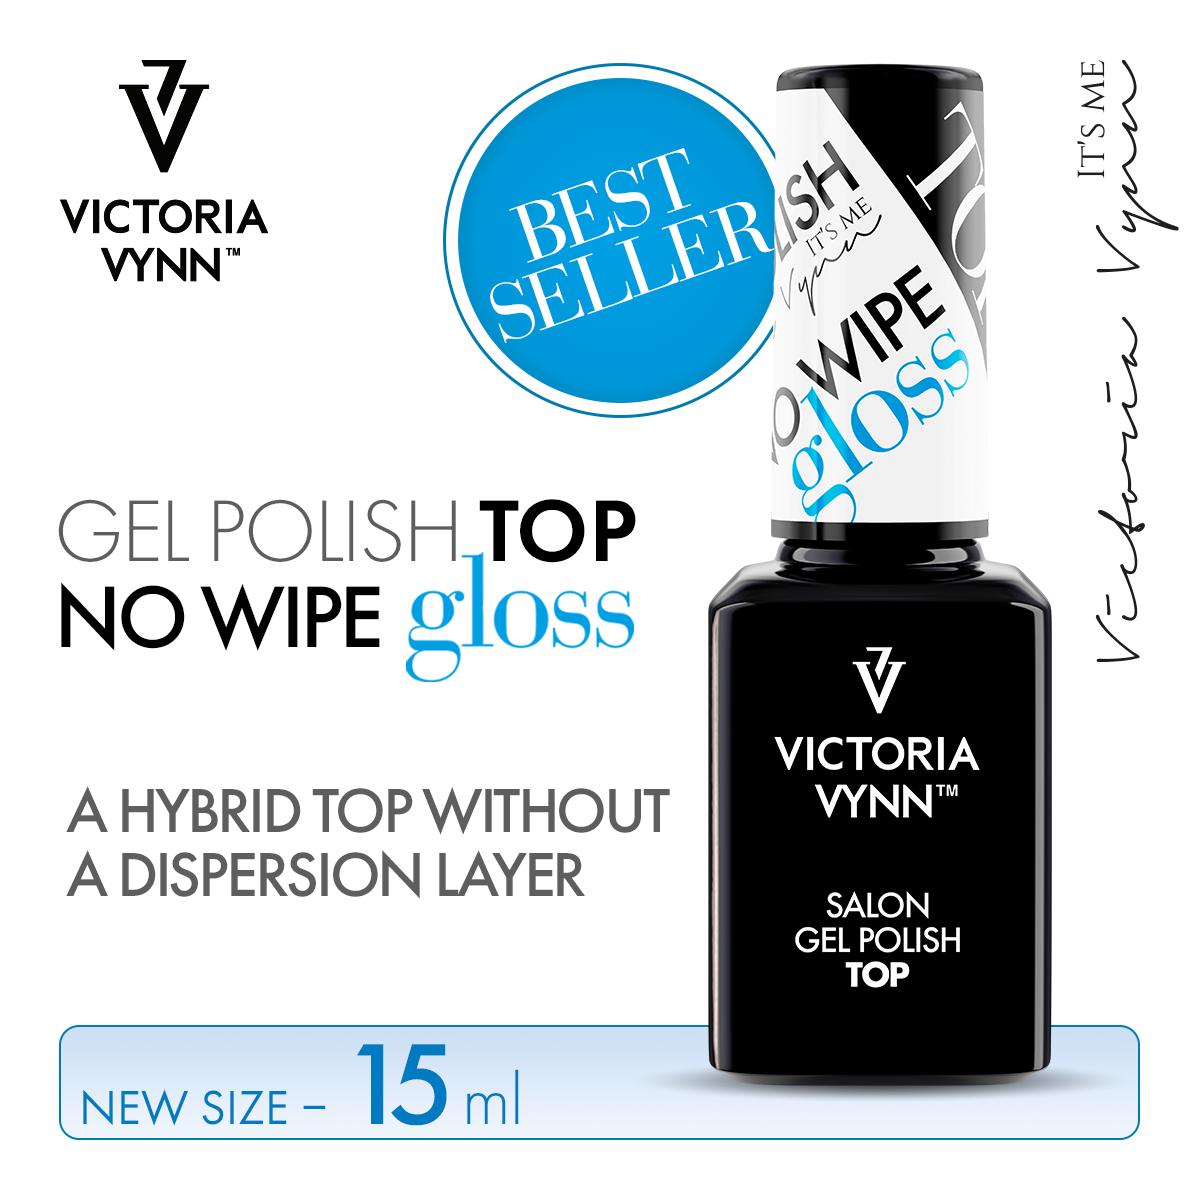 Top No Wipe Gloss Victoria Vynn - Grande